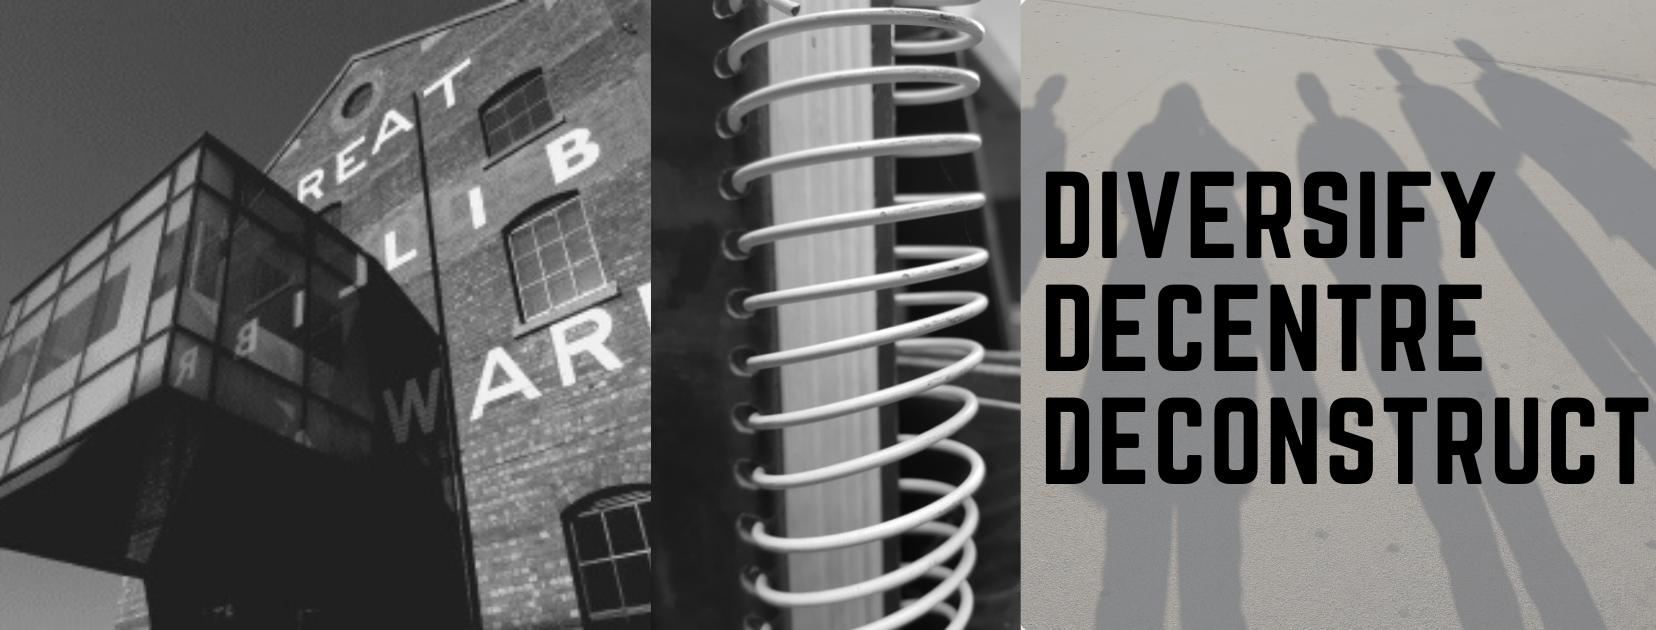 Diversify, decentre, deconstruct